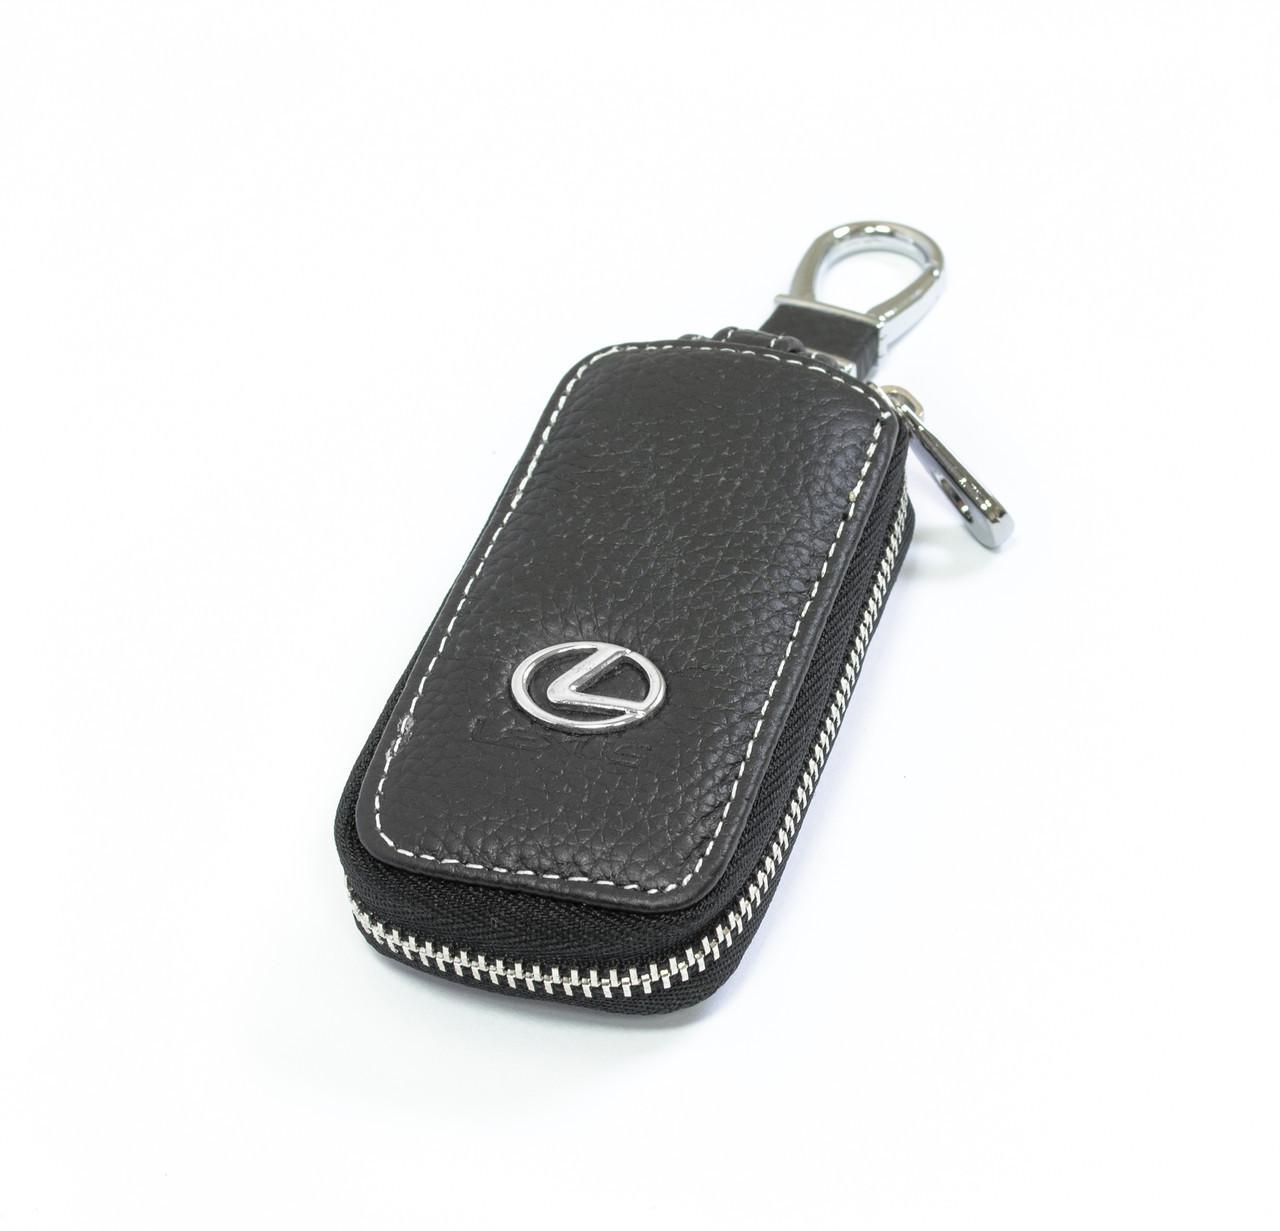 Ключница Carss с логотипом LEXUS 13010 черная